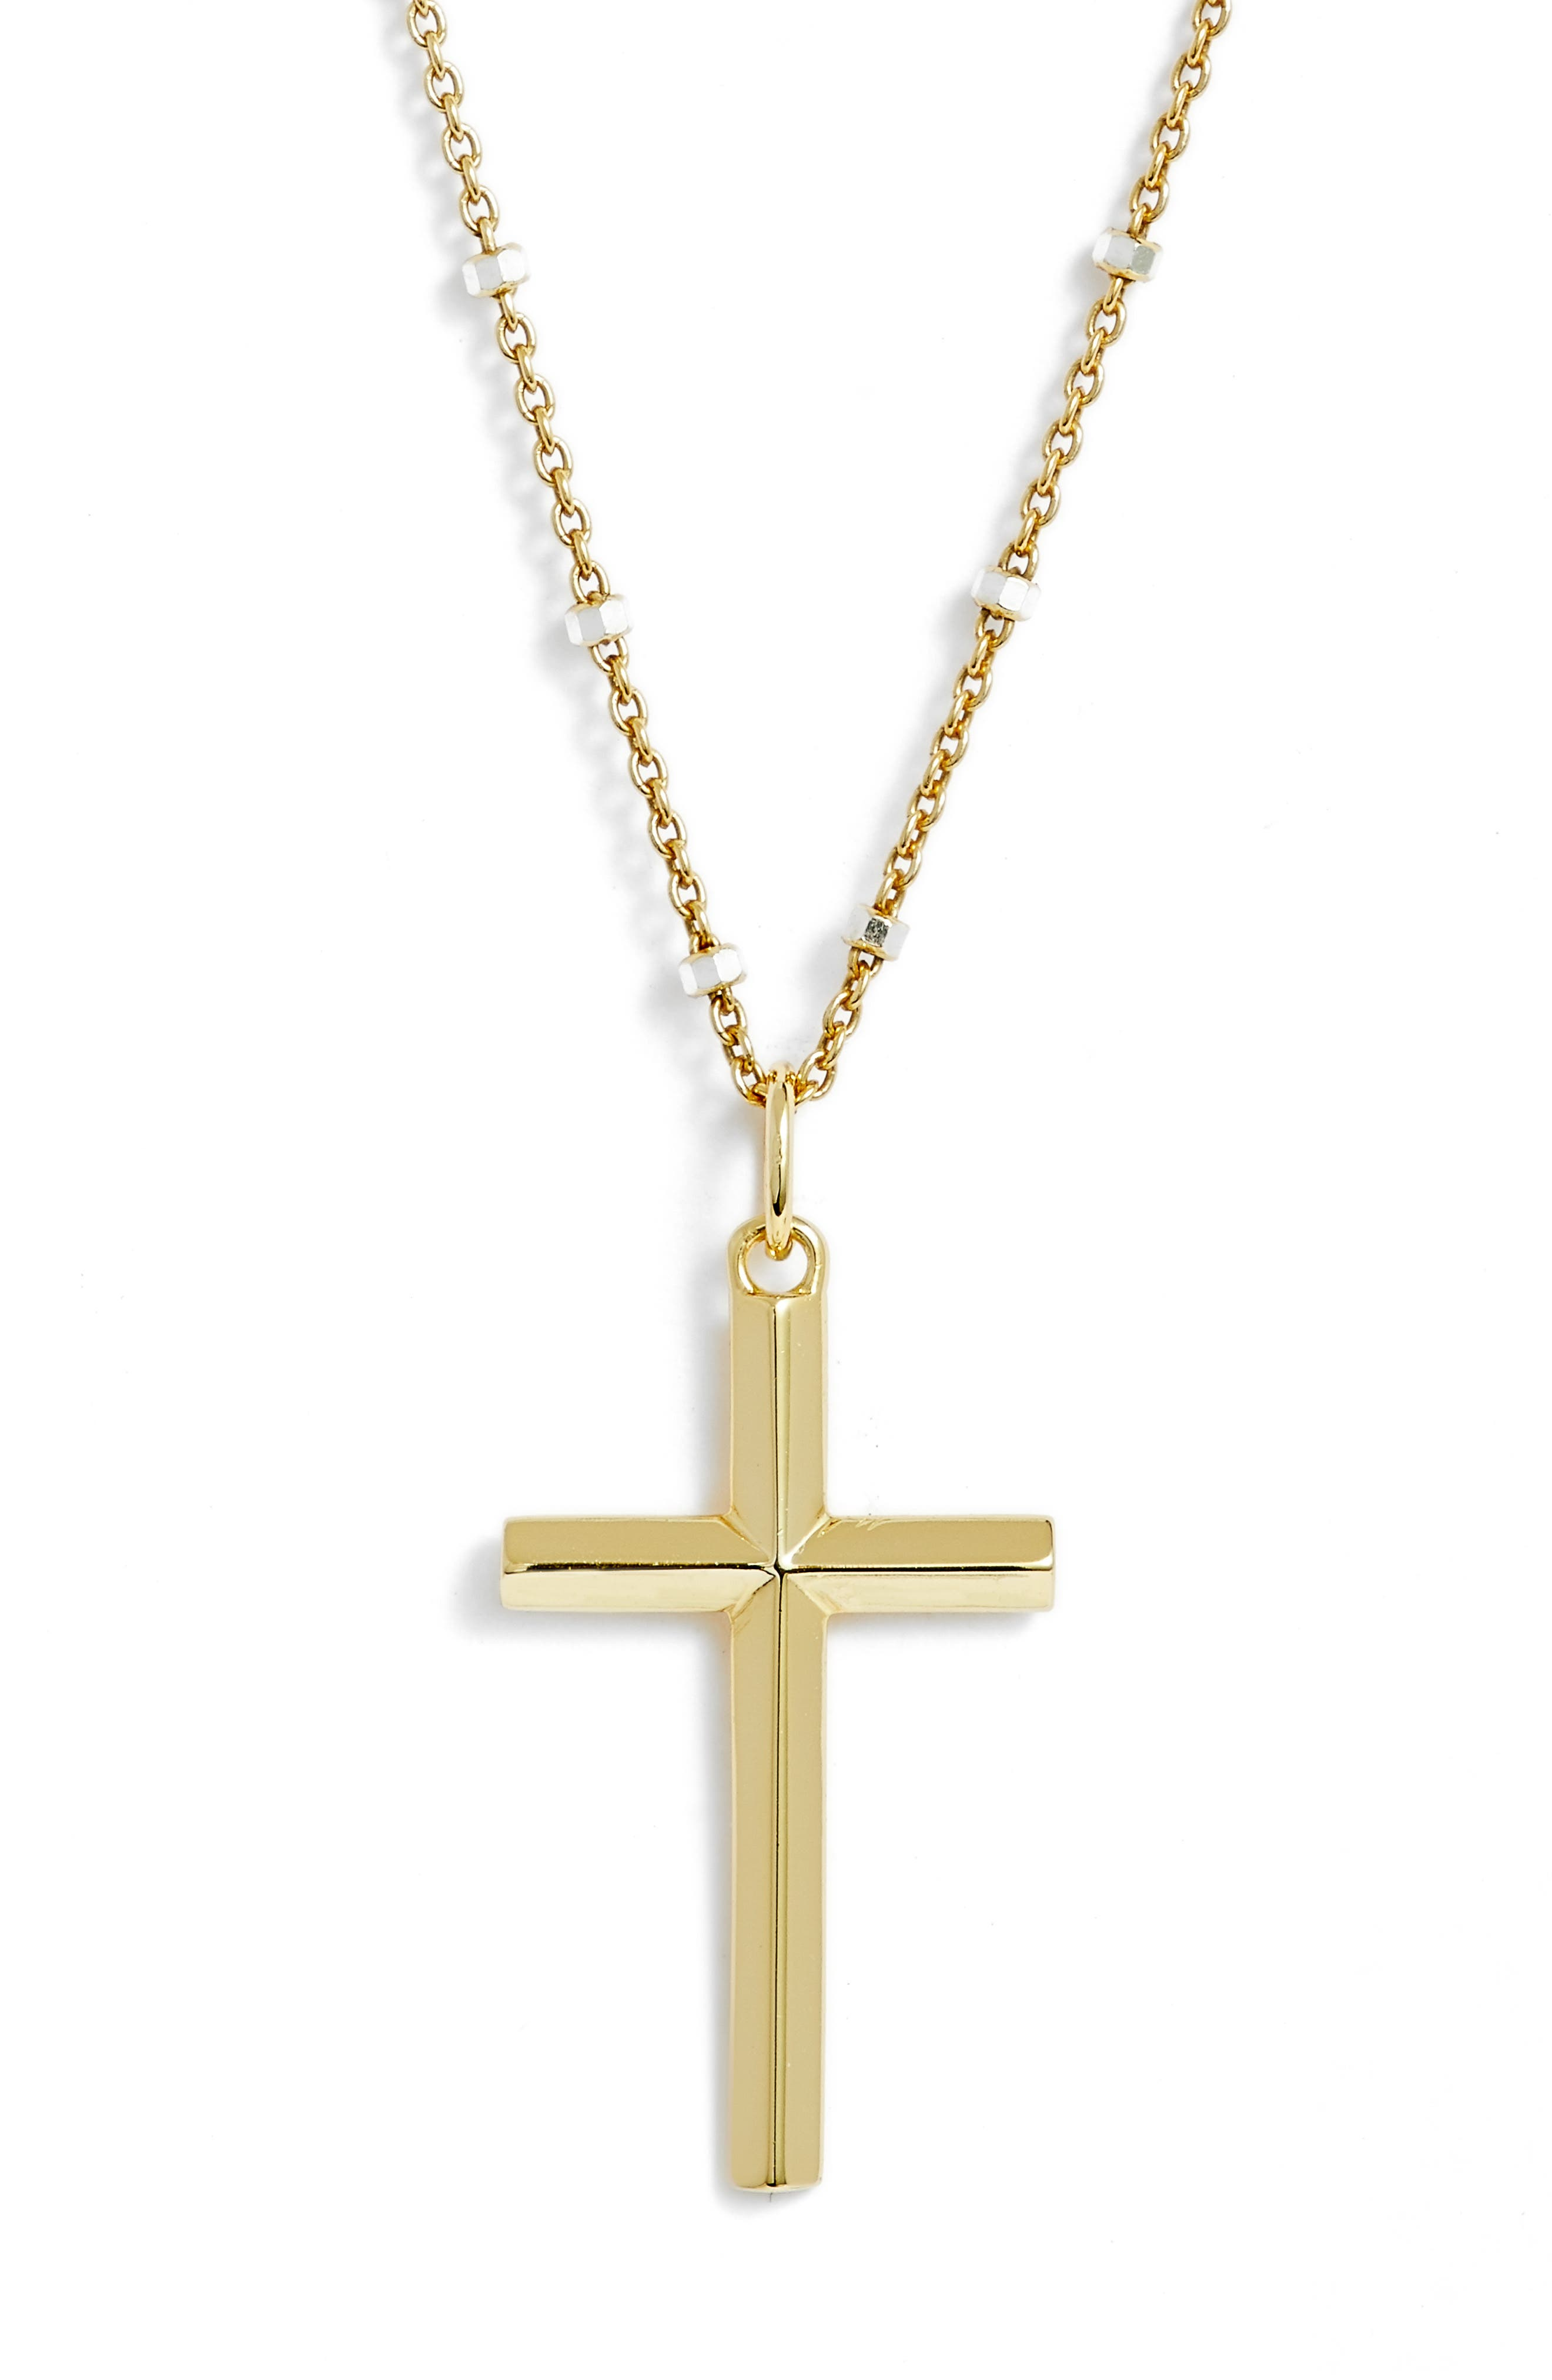 Argento Vivo Two-Tone Cross Pendant Necklace